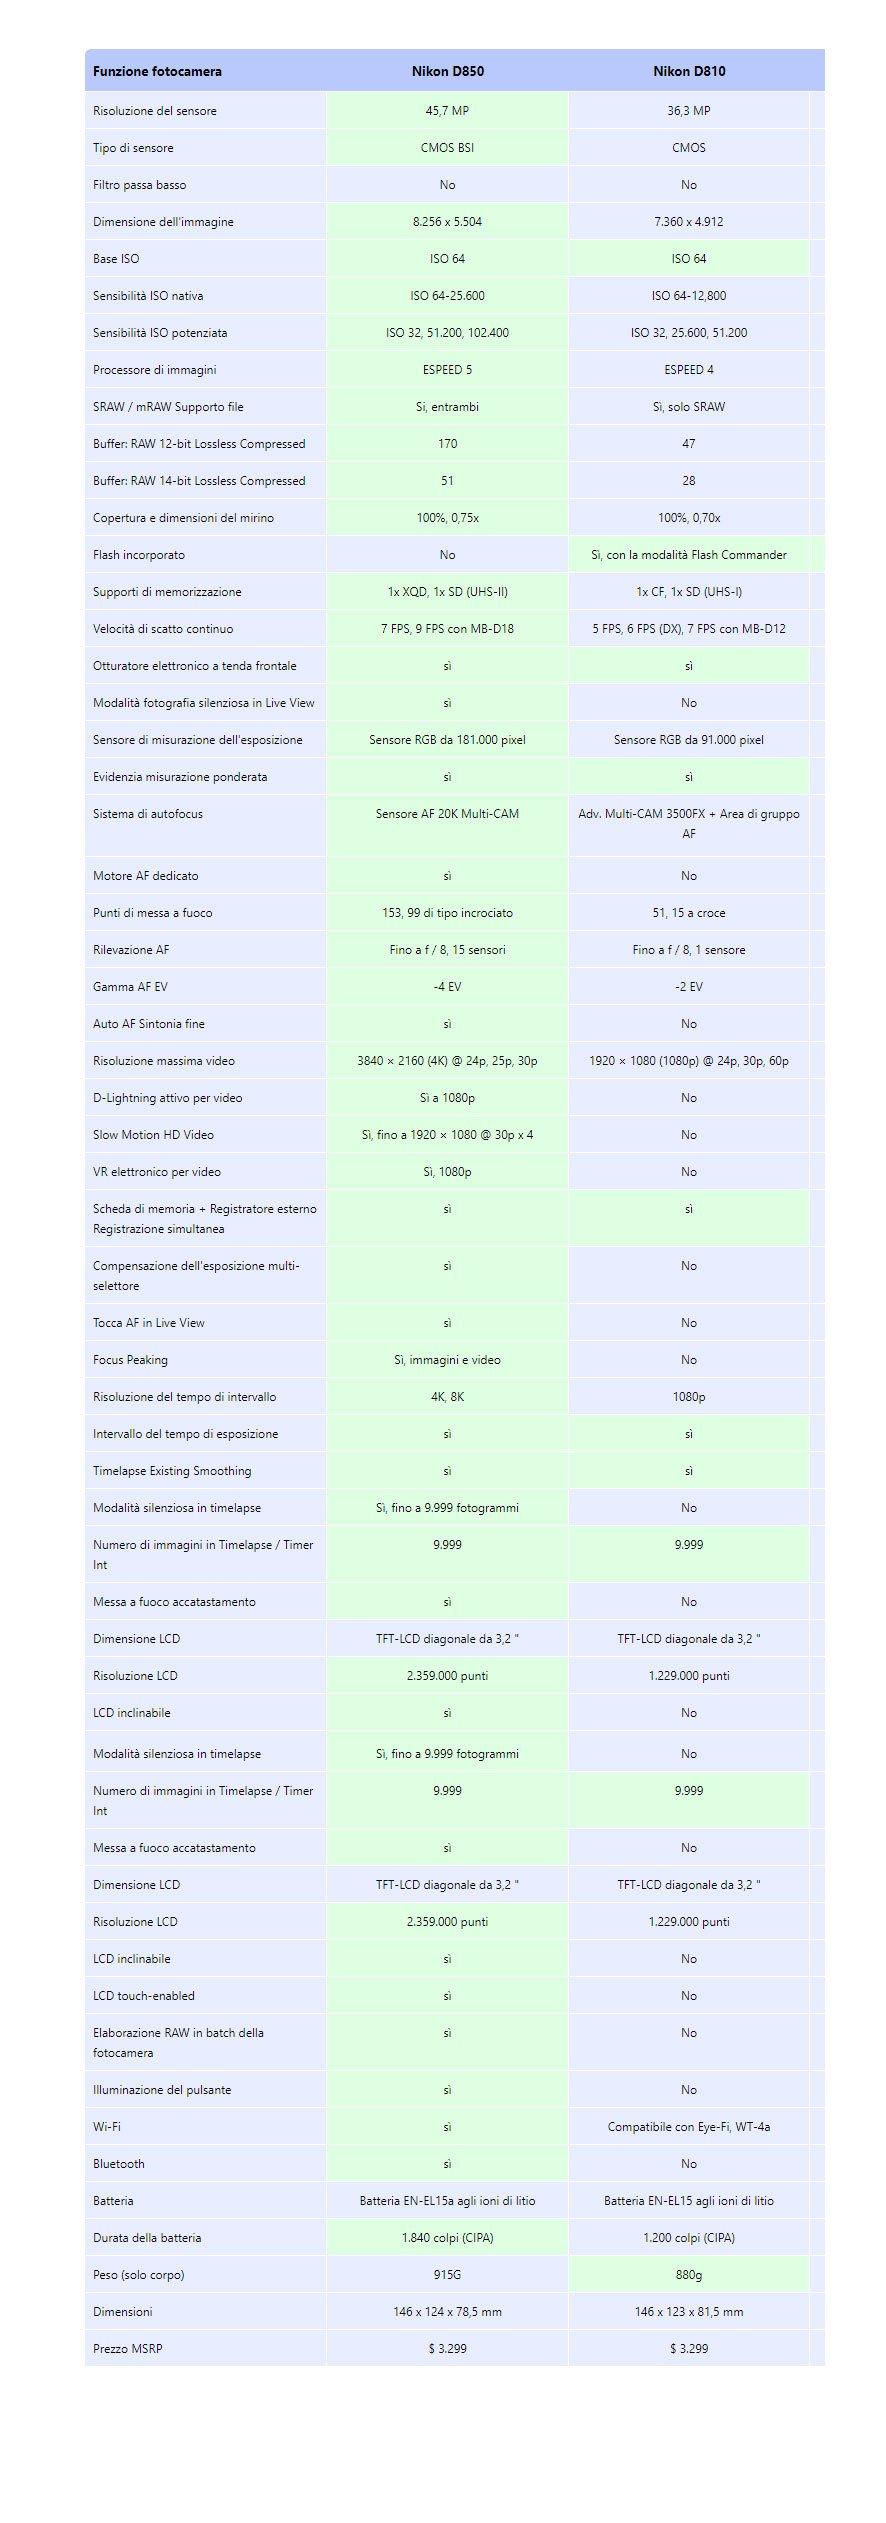 Differenze tra Nikon D850 e D810